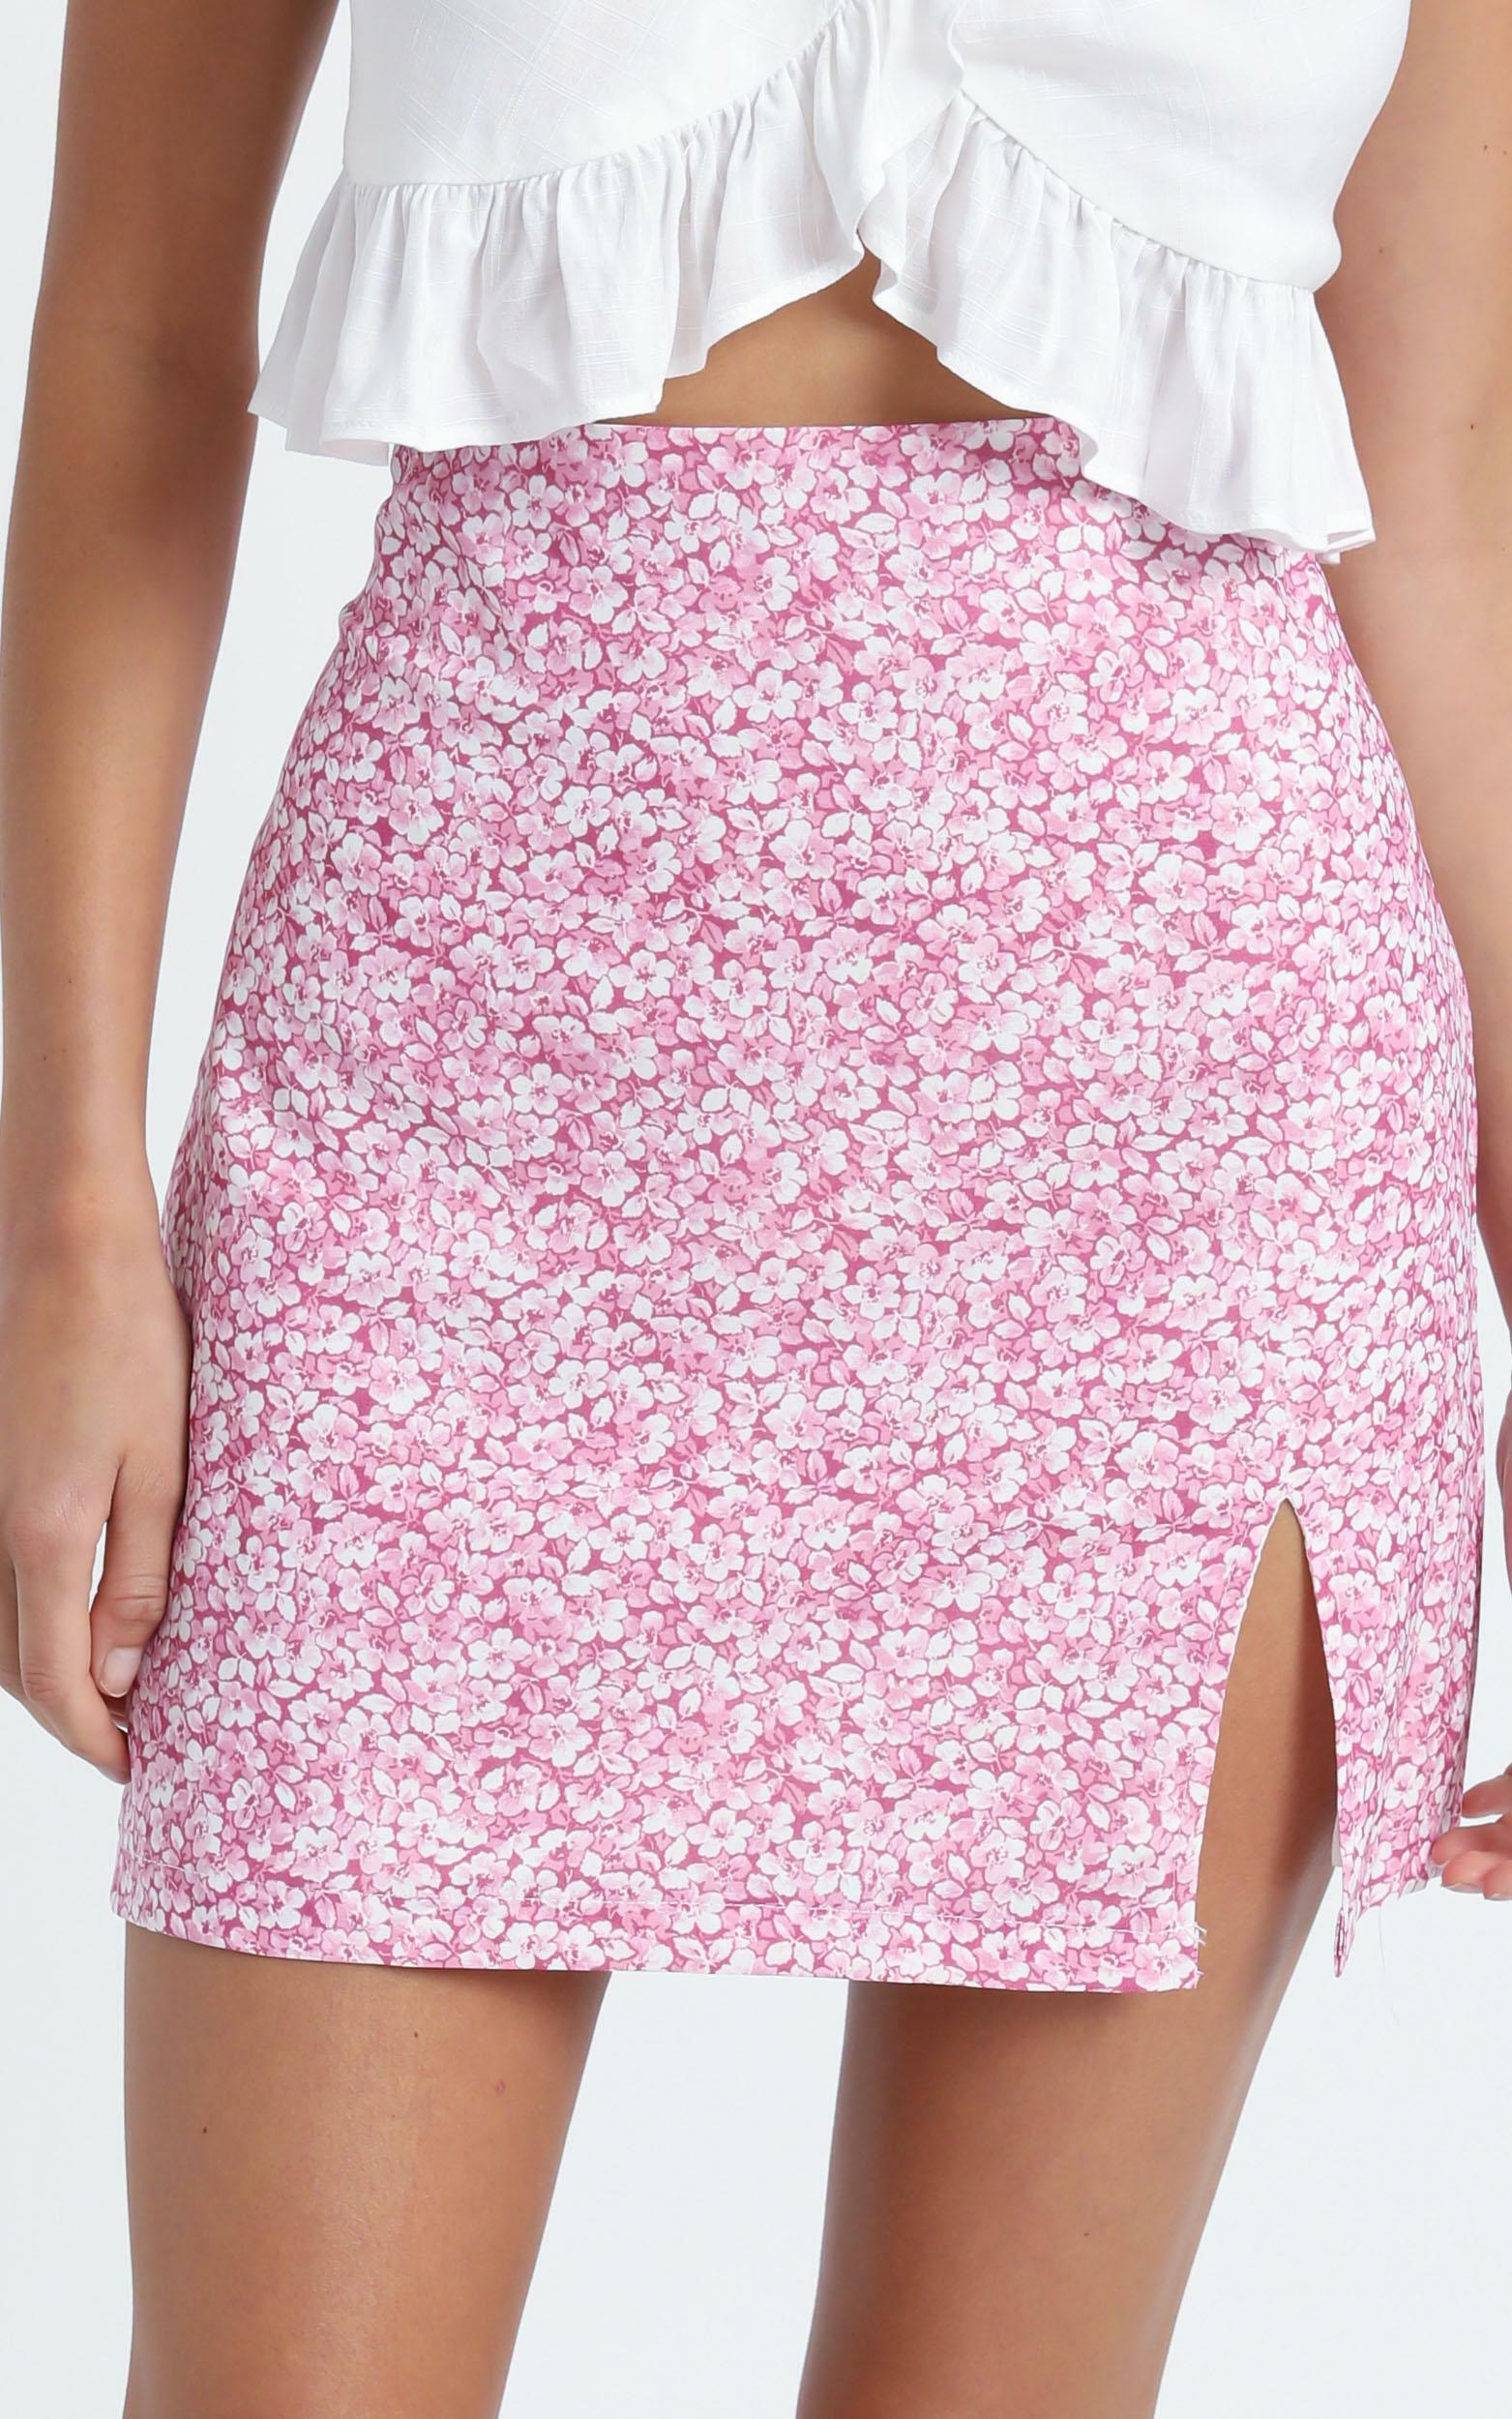 Sazan Skirt in Pink Floral - 6 (XS), Pink, hi-res image number null